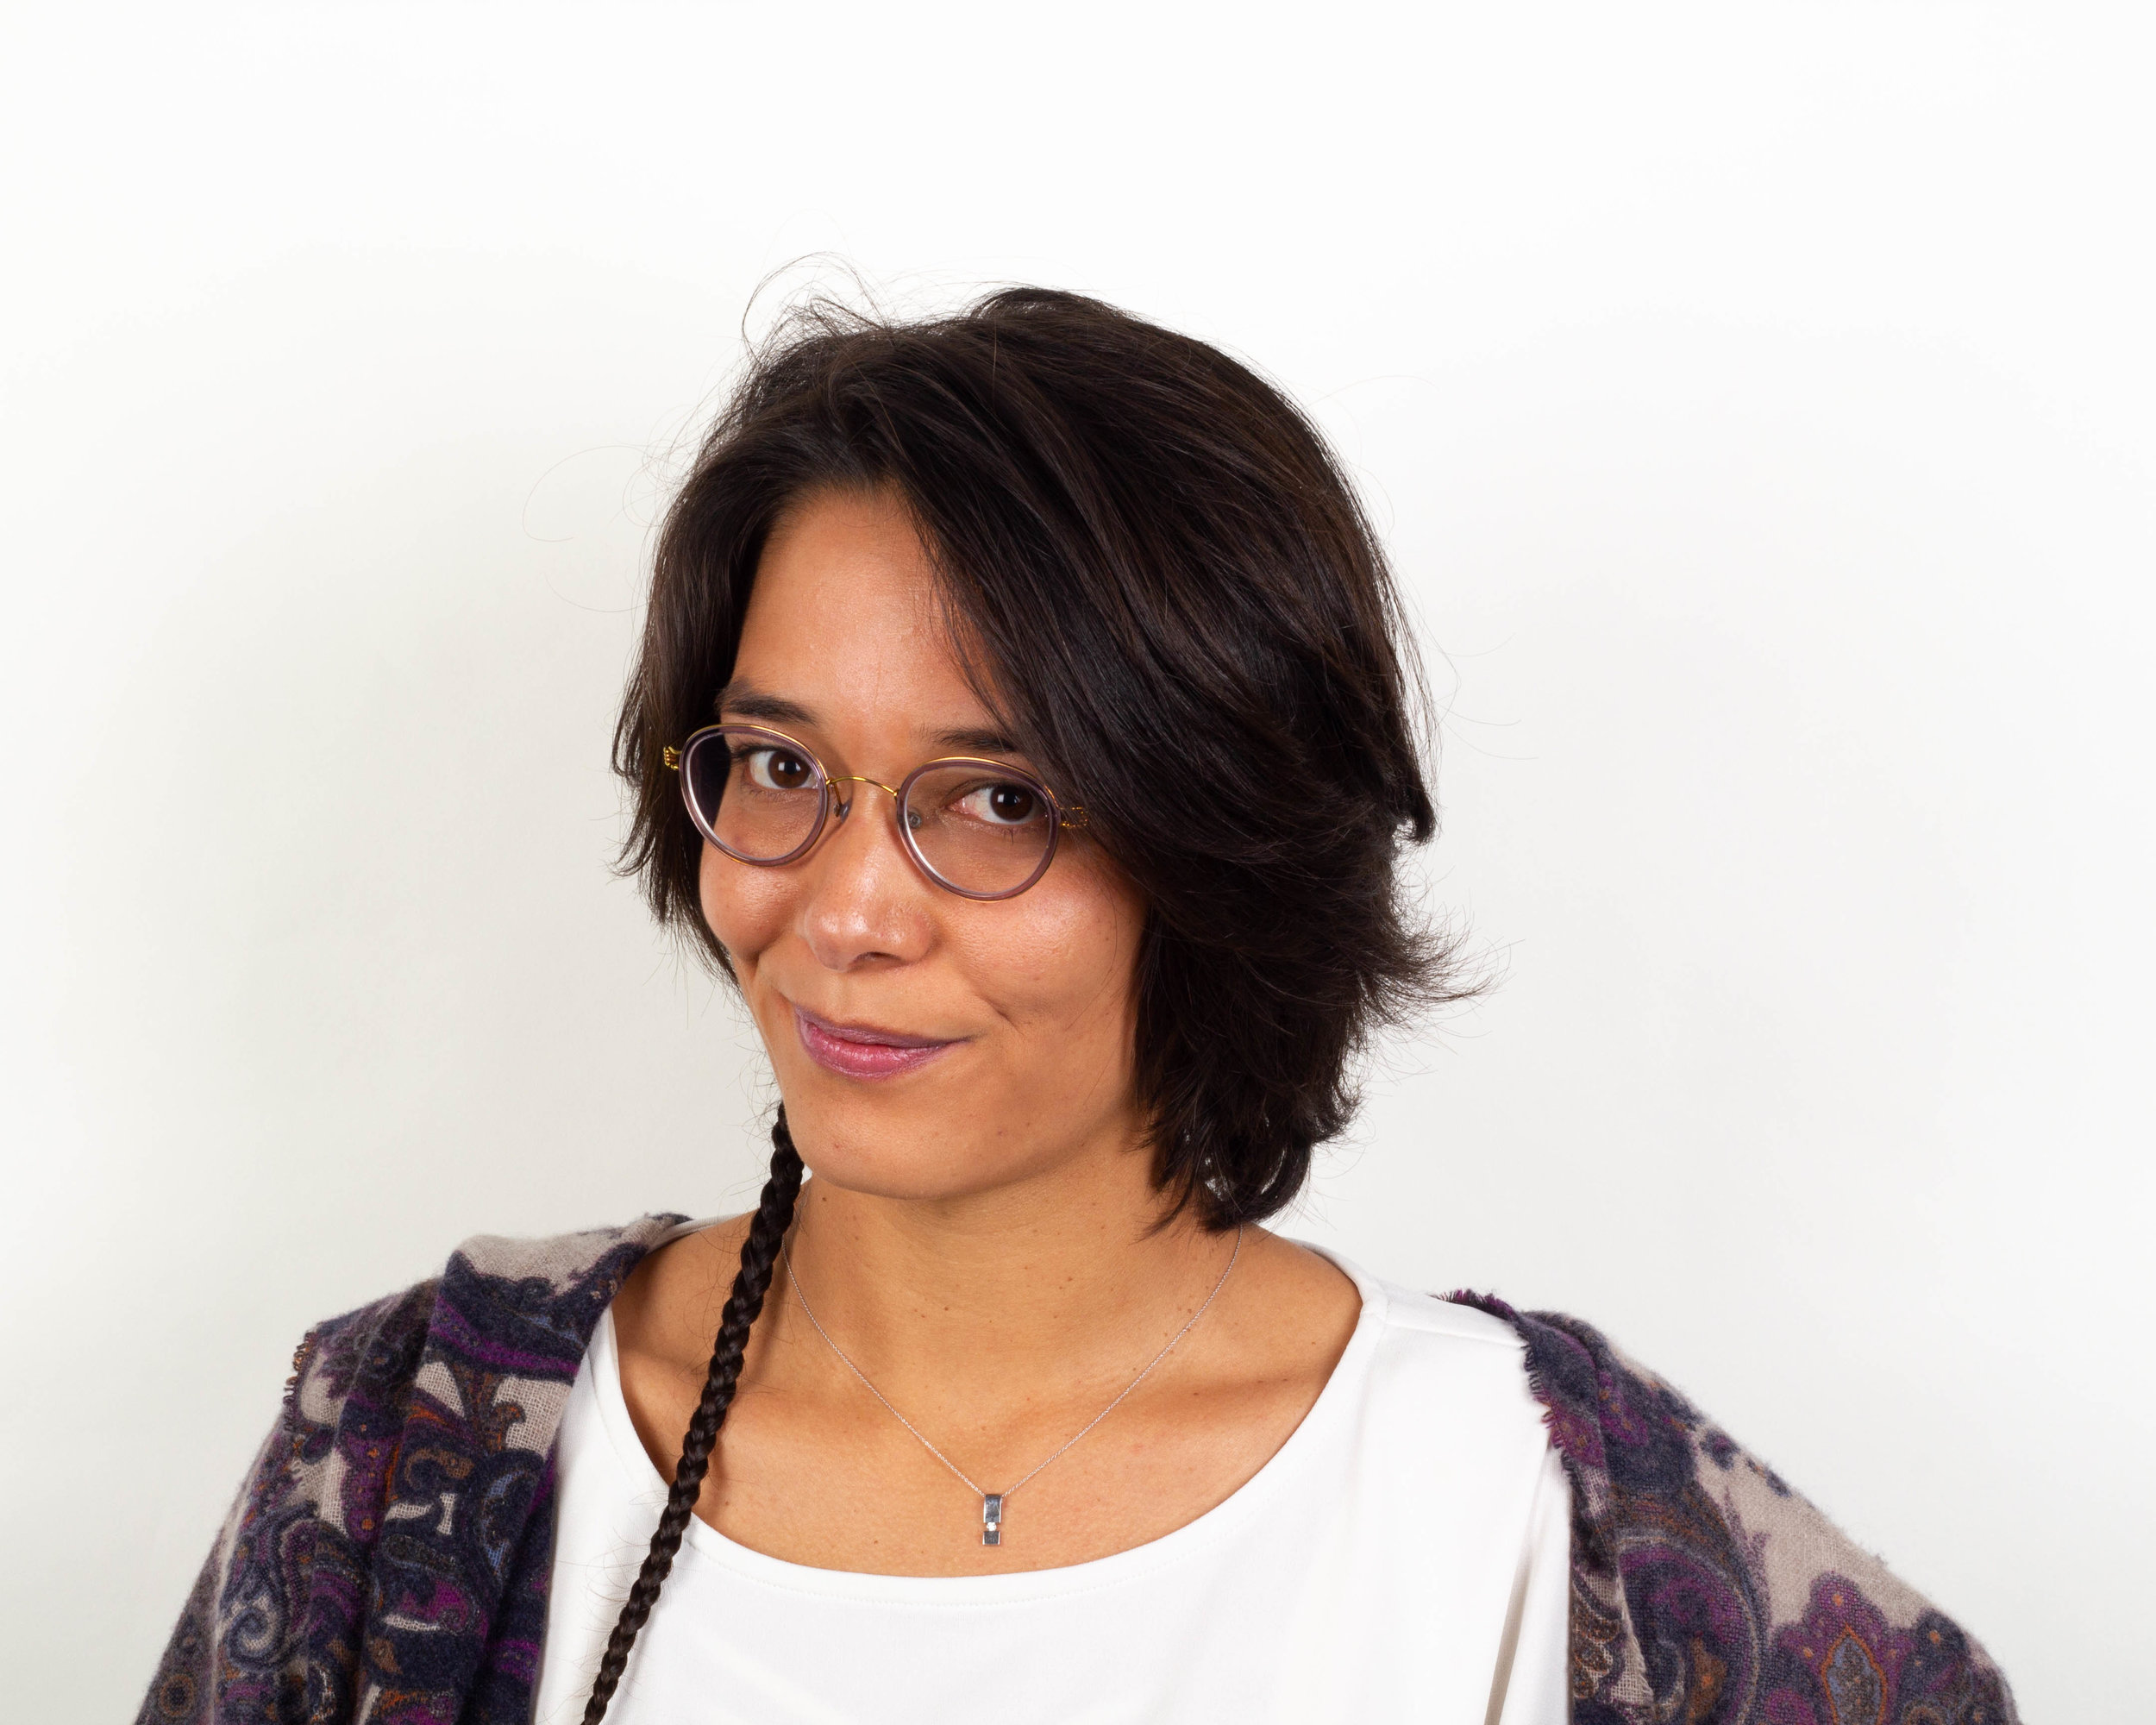 N. Kaori Fornós Ohnuma Marketingstrateeg